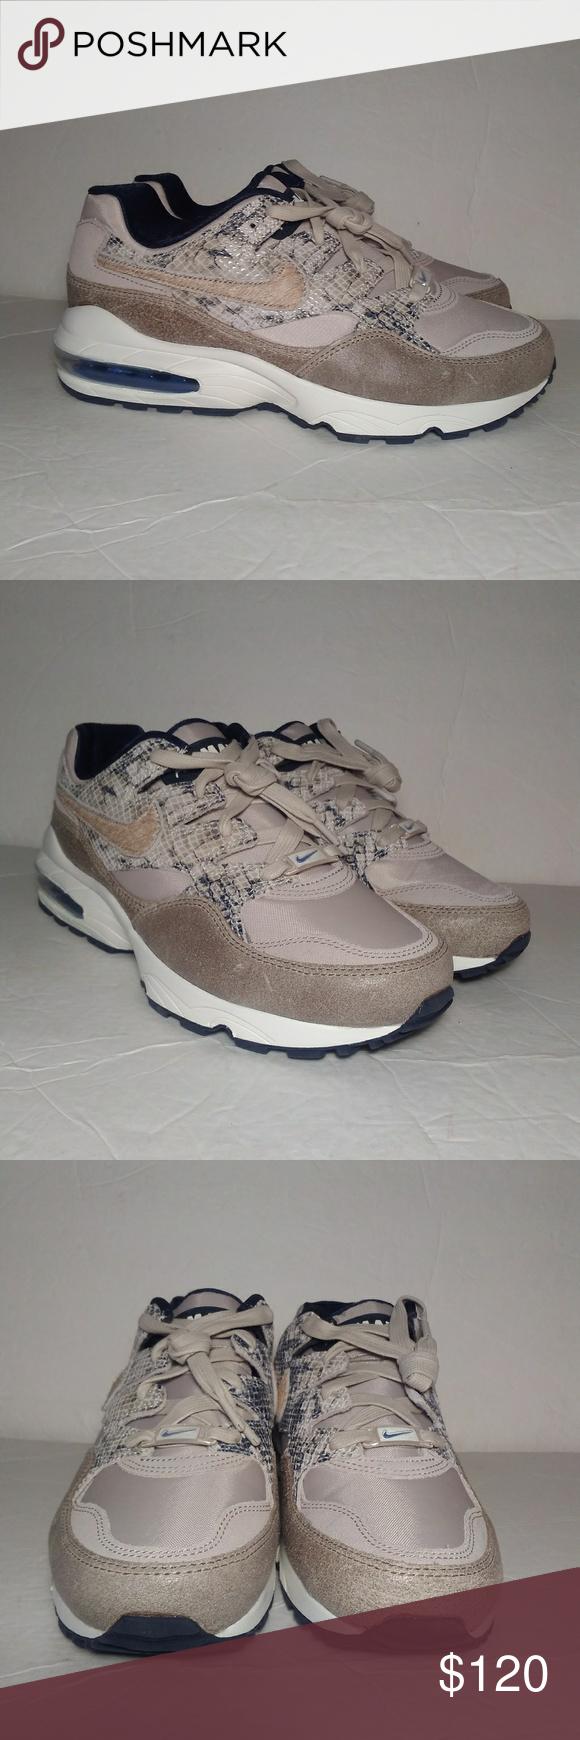 0a3c82ad0c Nike Air Max 94 AT8439-001 Men Size 8 Nike Air Max 94 AT8439-001 Men Size 8 Nike  Shoes Sneakers